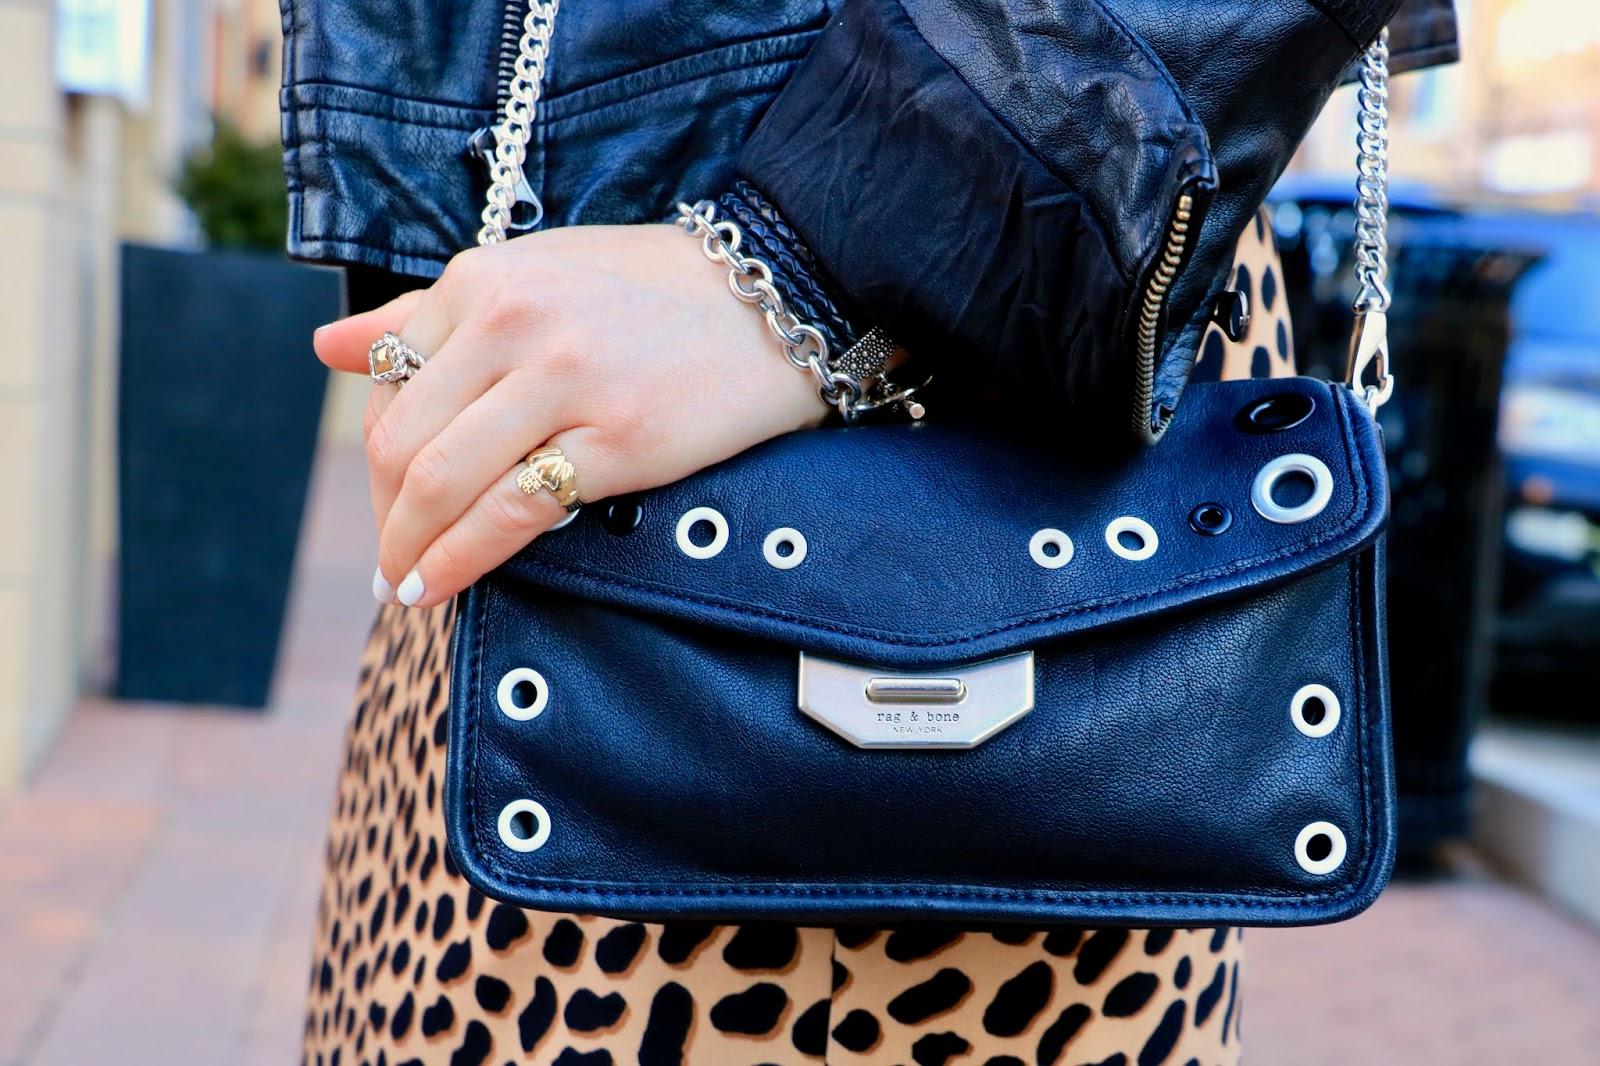 Nyc fashion blogger Kathleen Harper's rag and bone crossbody purse